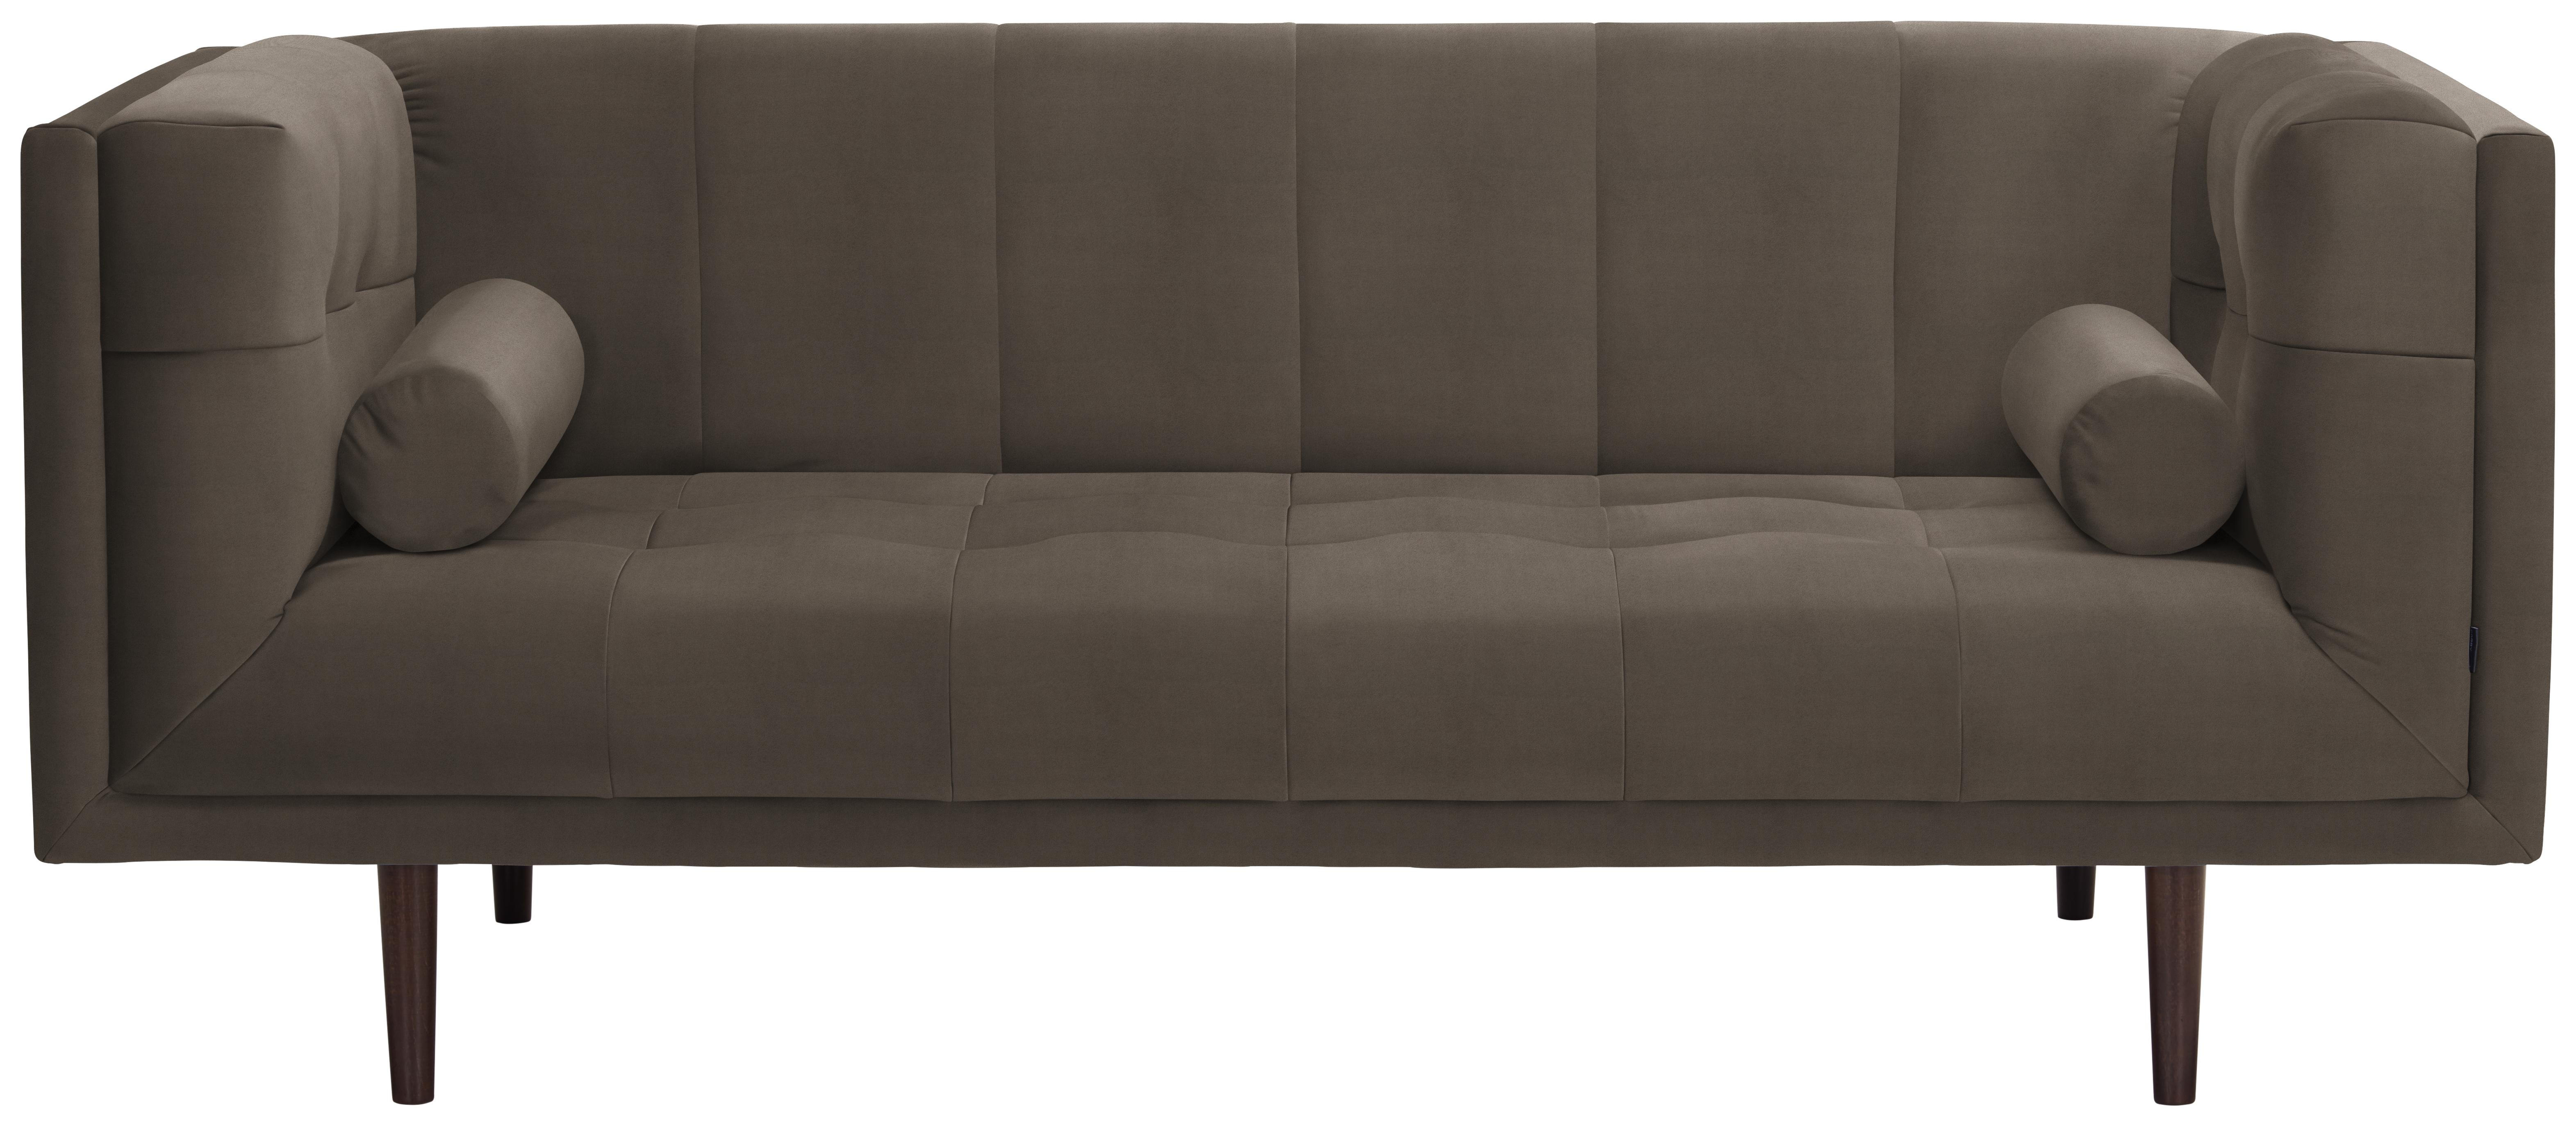 SOFA   Taupe/Dunkelbraun, Design, Holzwerkstoff/Textil (200/80/